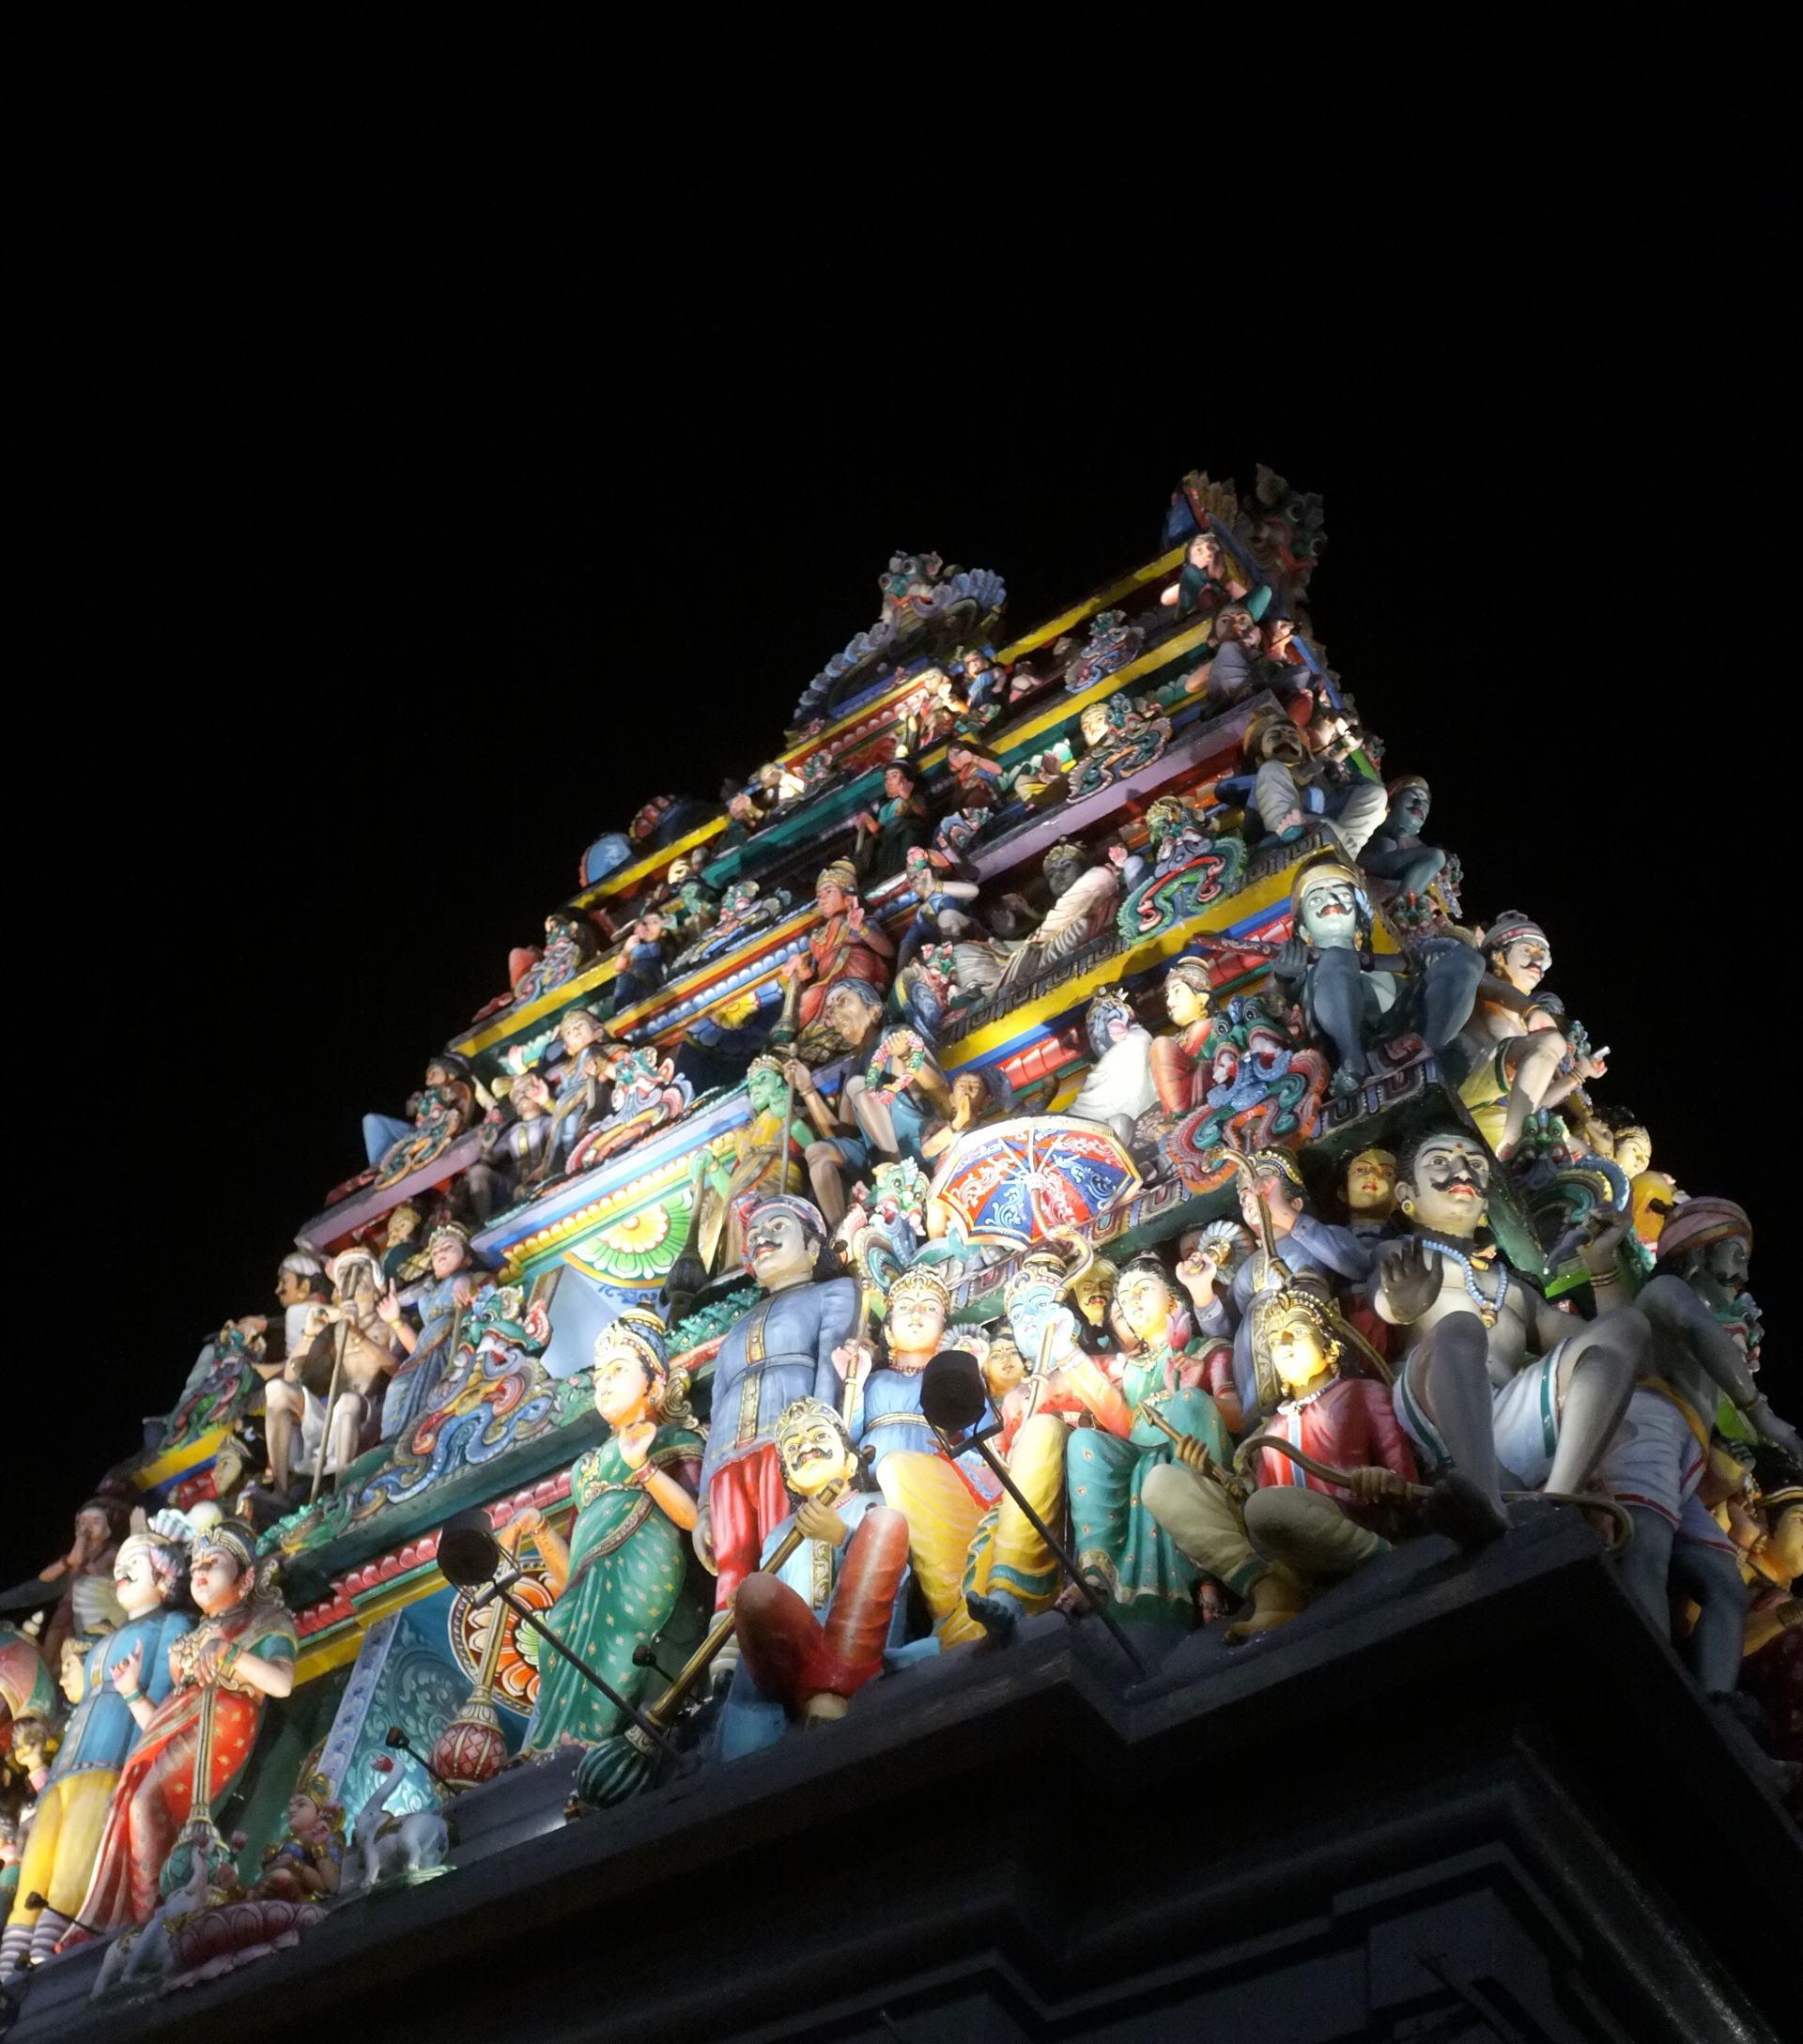 Singapore Sri Mariamman hindu temple